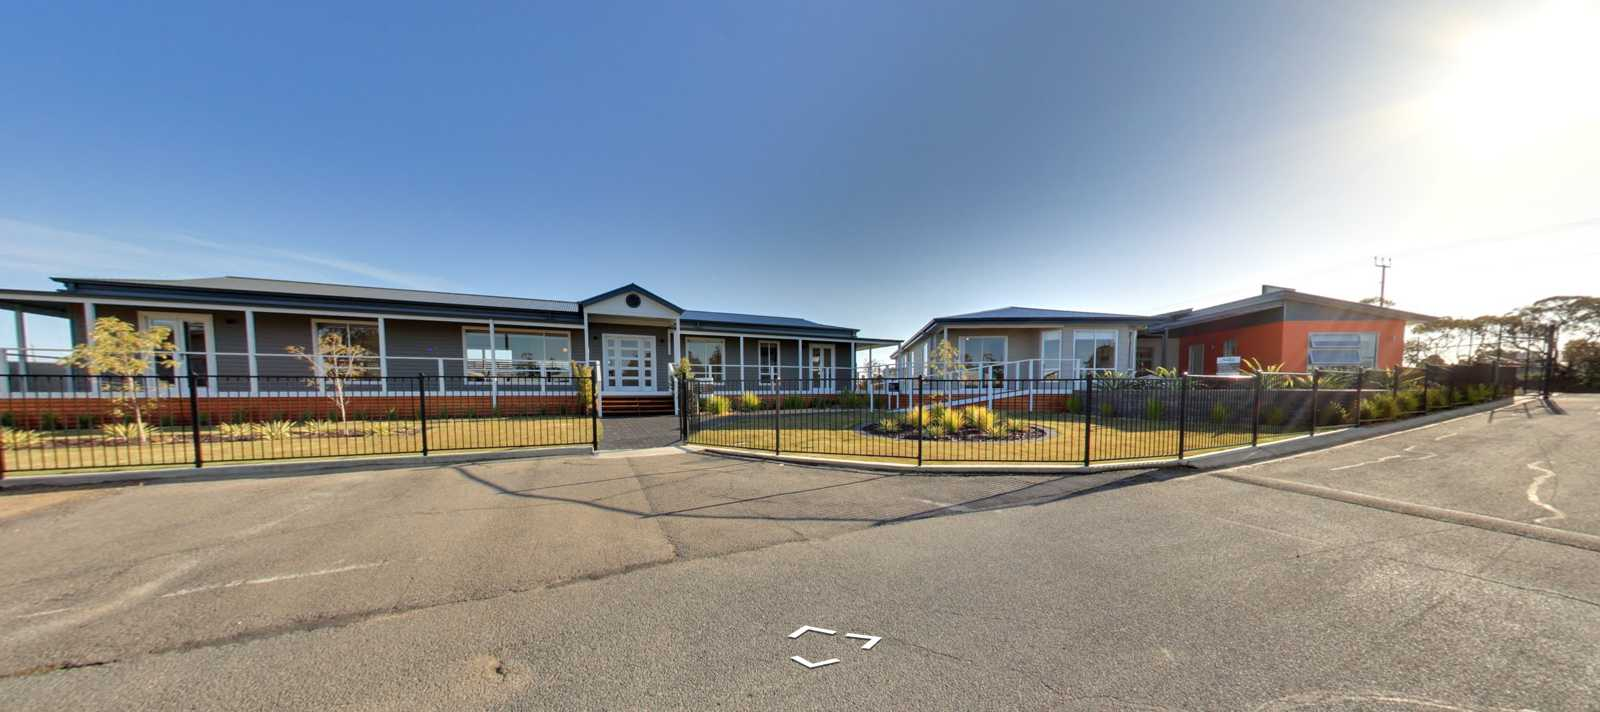 Kookaburra Homes display village - new online Murray Bridge Directory